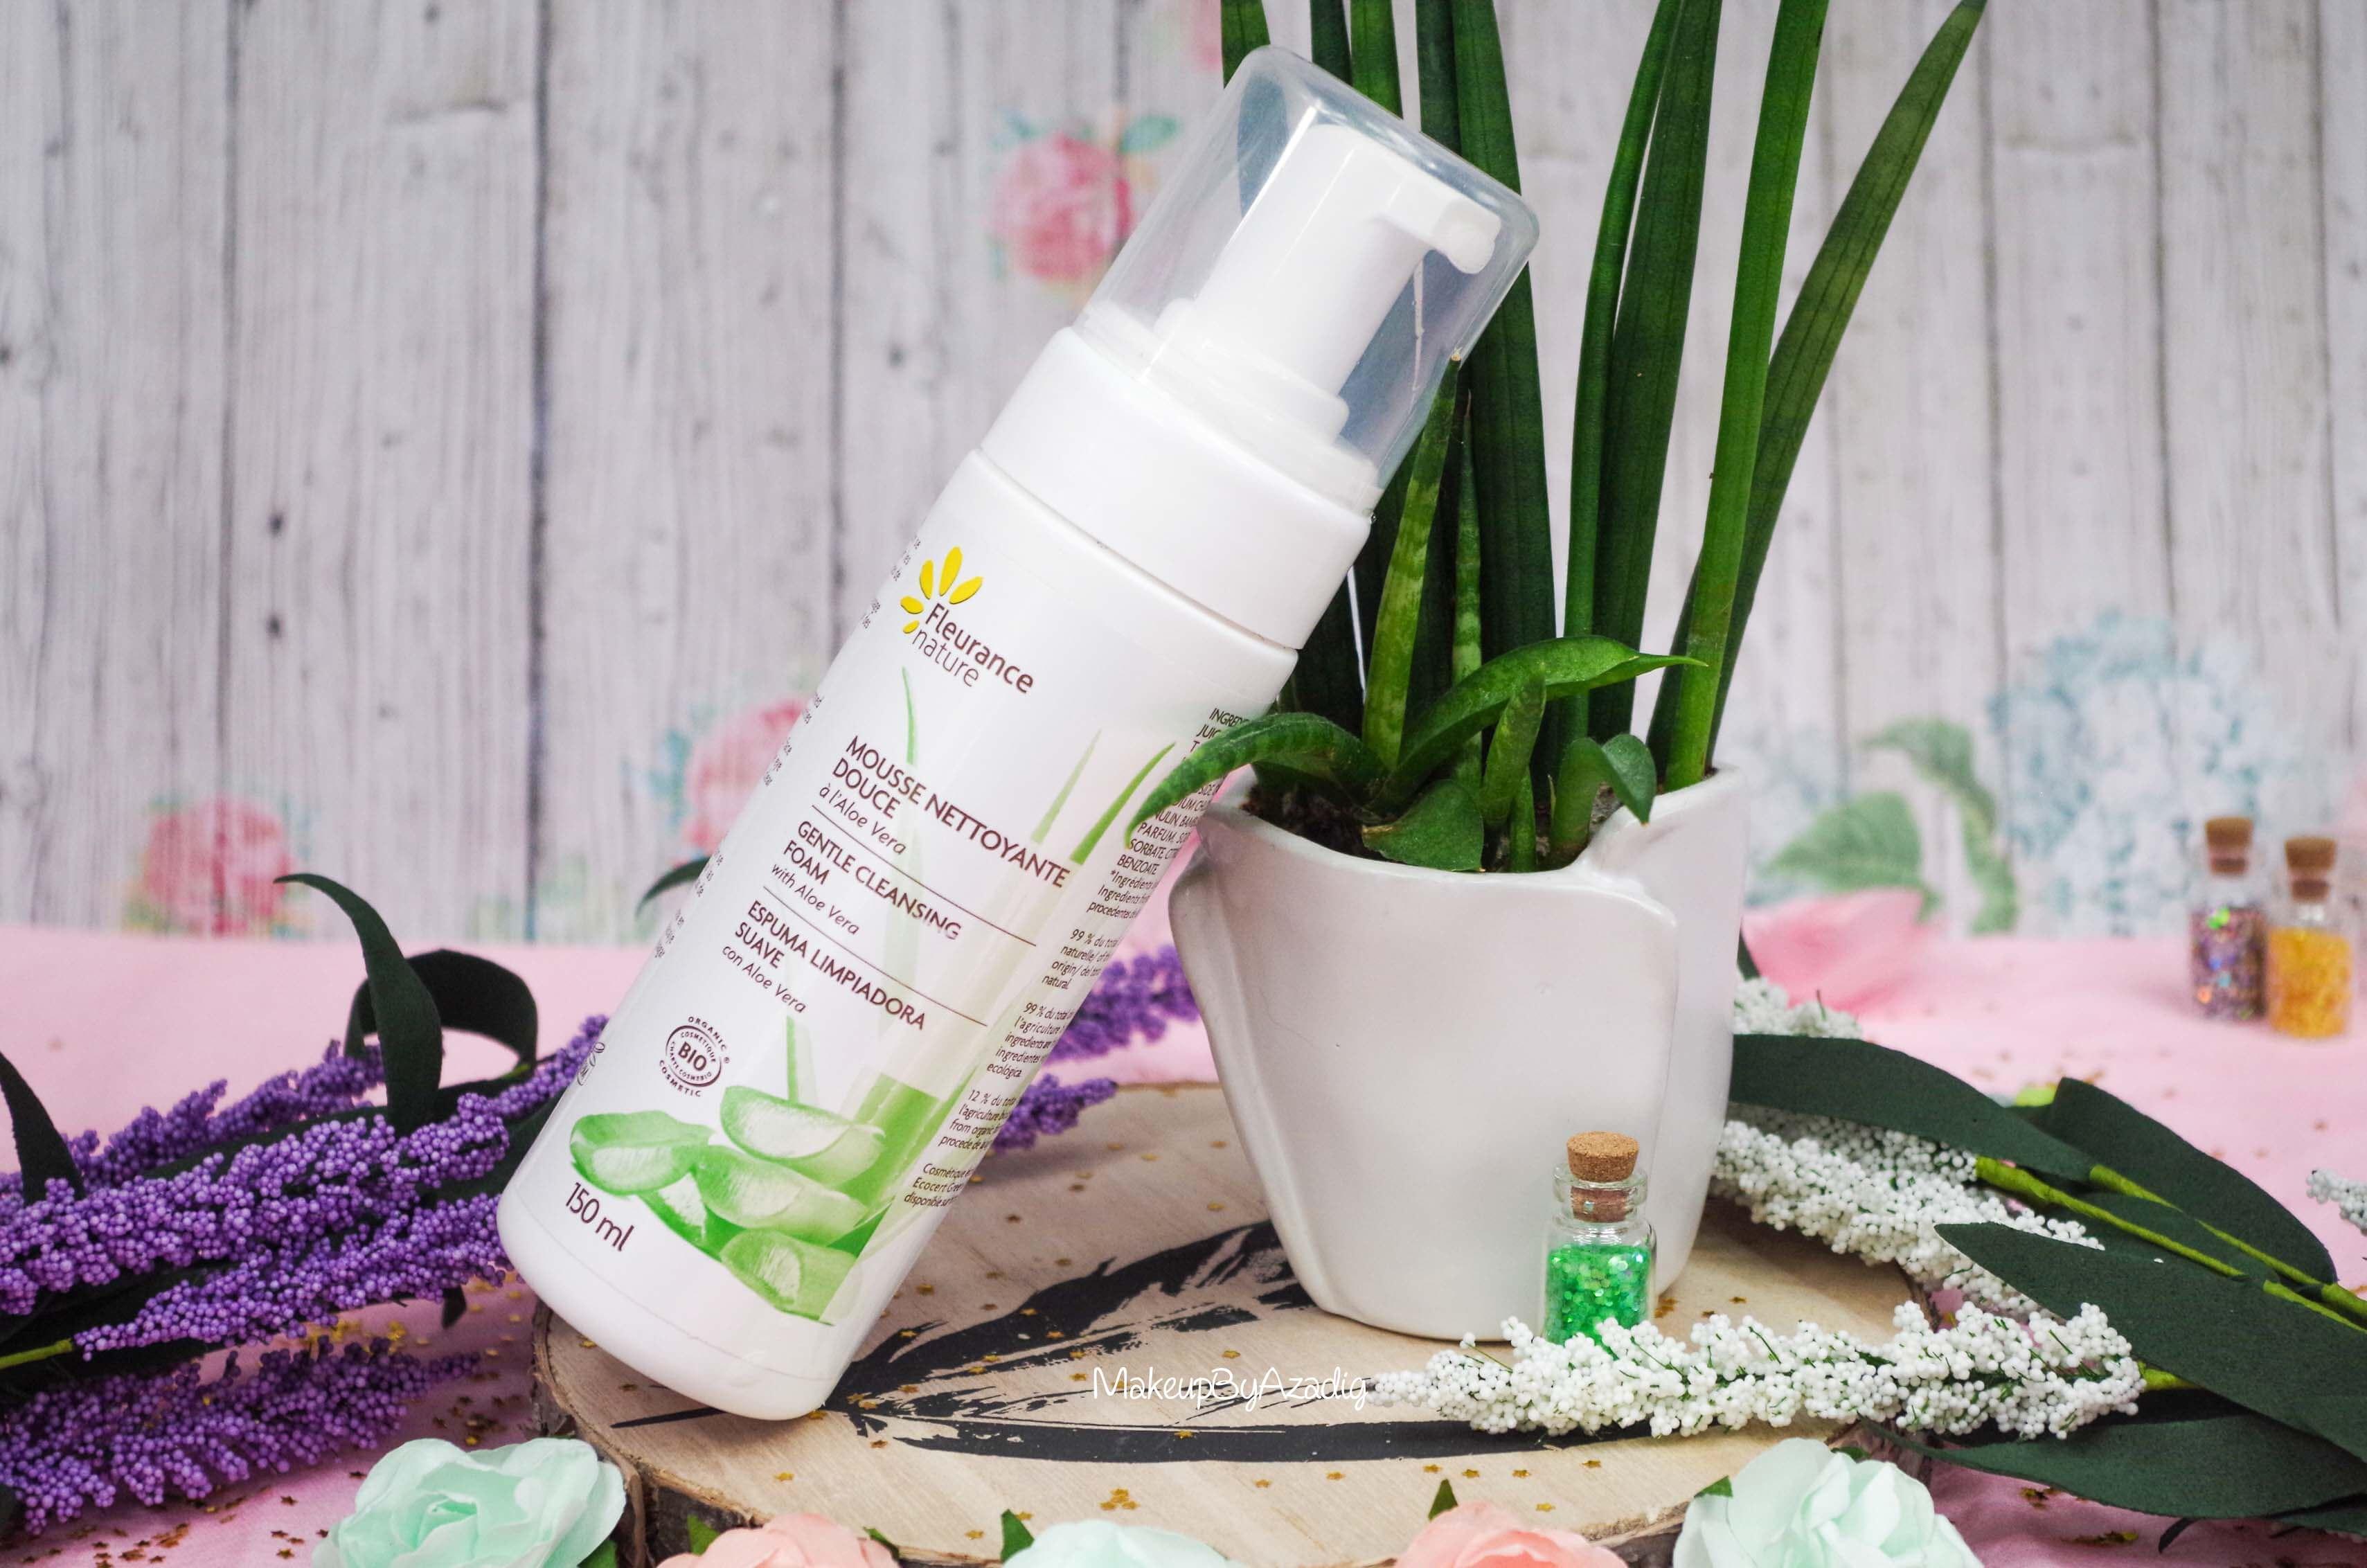 aloe-revue-review-mousse-nettoyante-douce-fleurance-nature-partenariat-soin-bio-makeupbyazadig-avis-prix-influencer